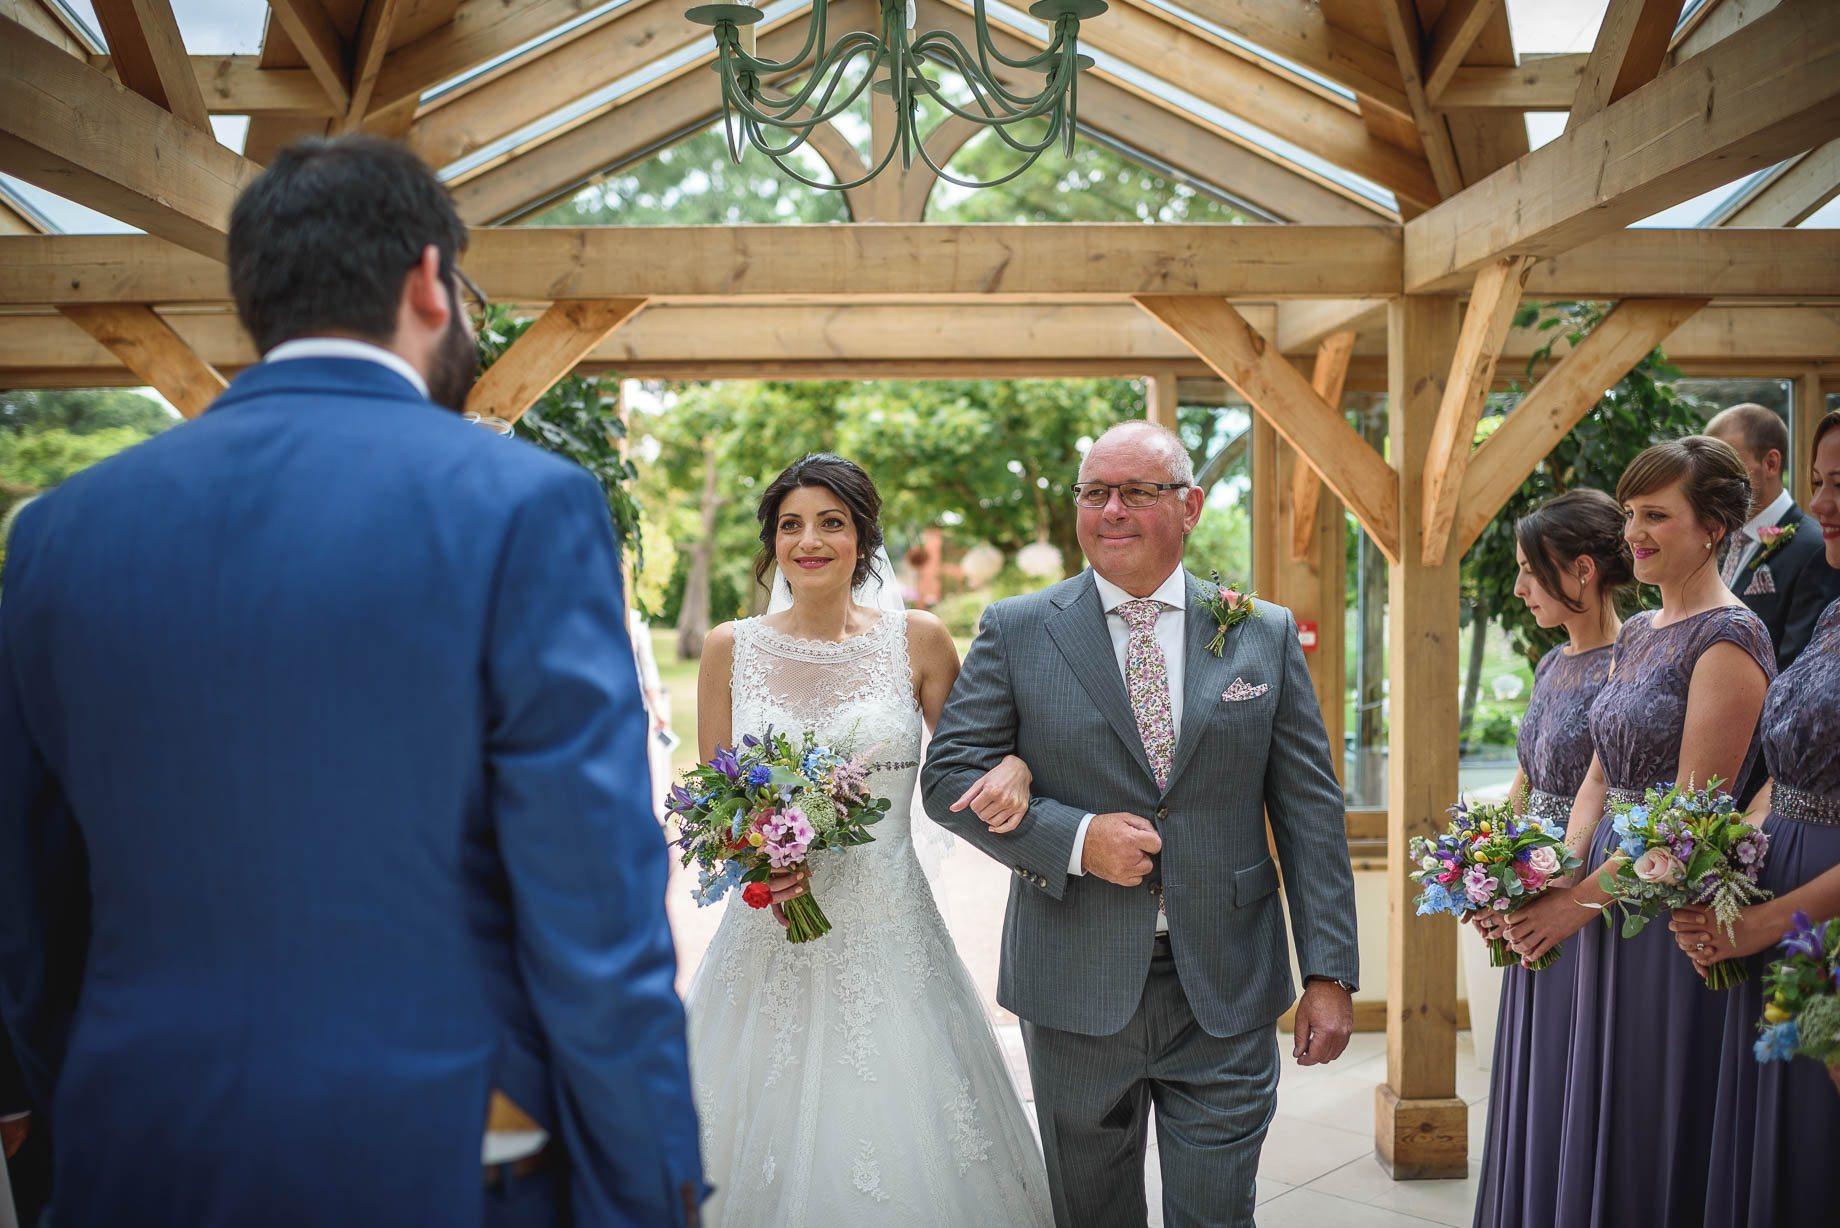 Gaynes Park wedding photography - Guy Collier Photography - Rachel and Jon (65 of 169)